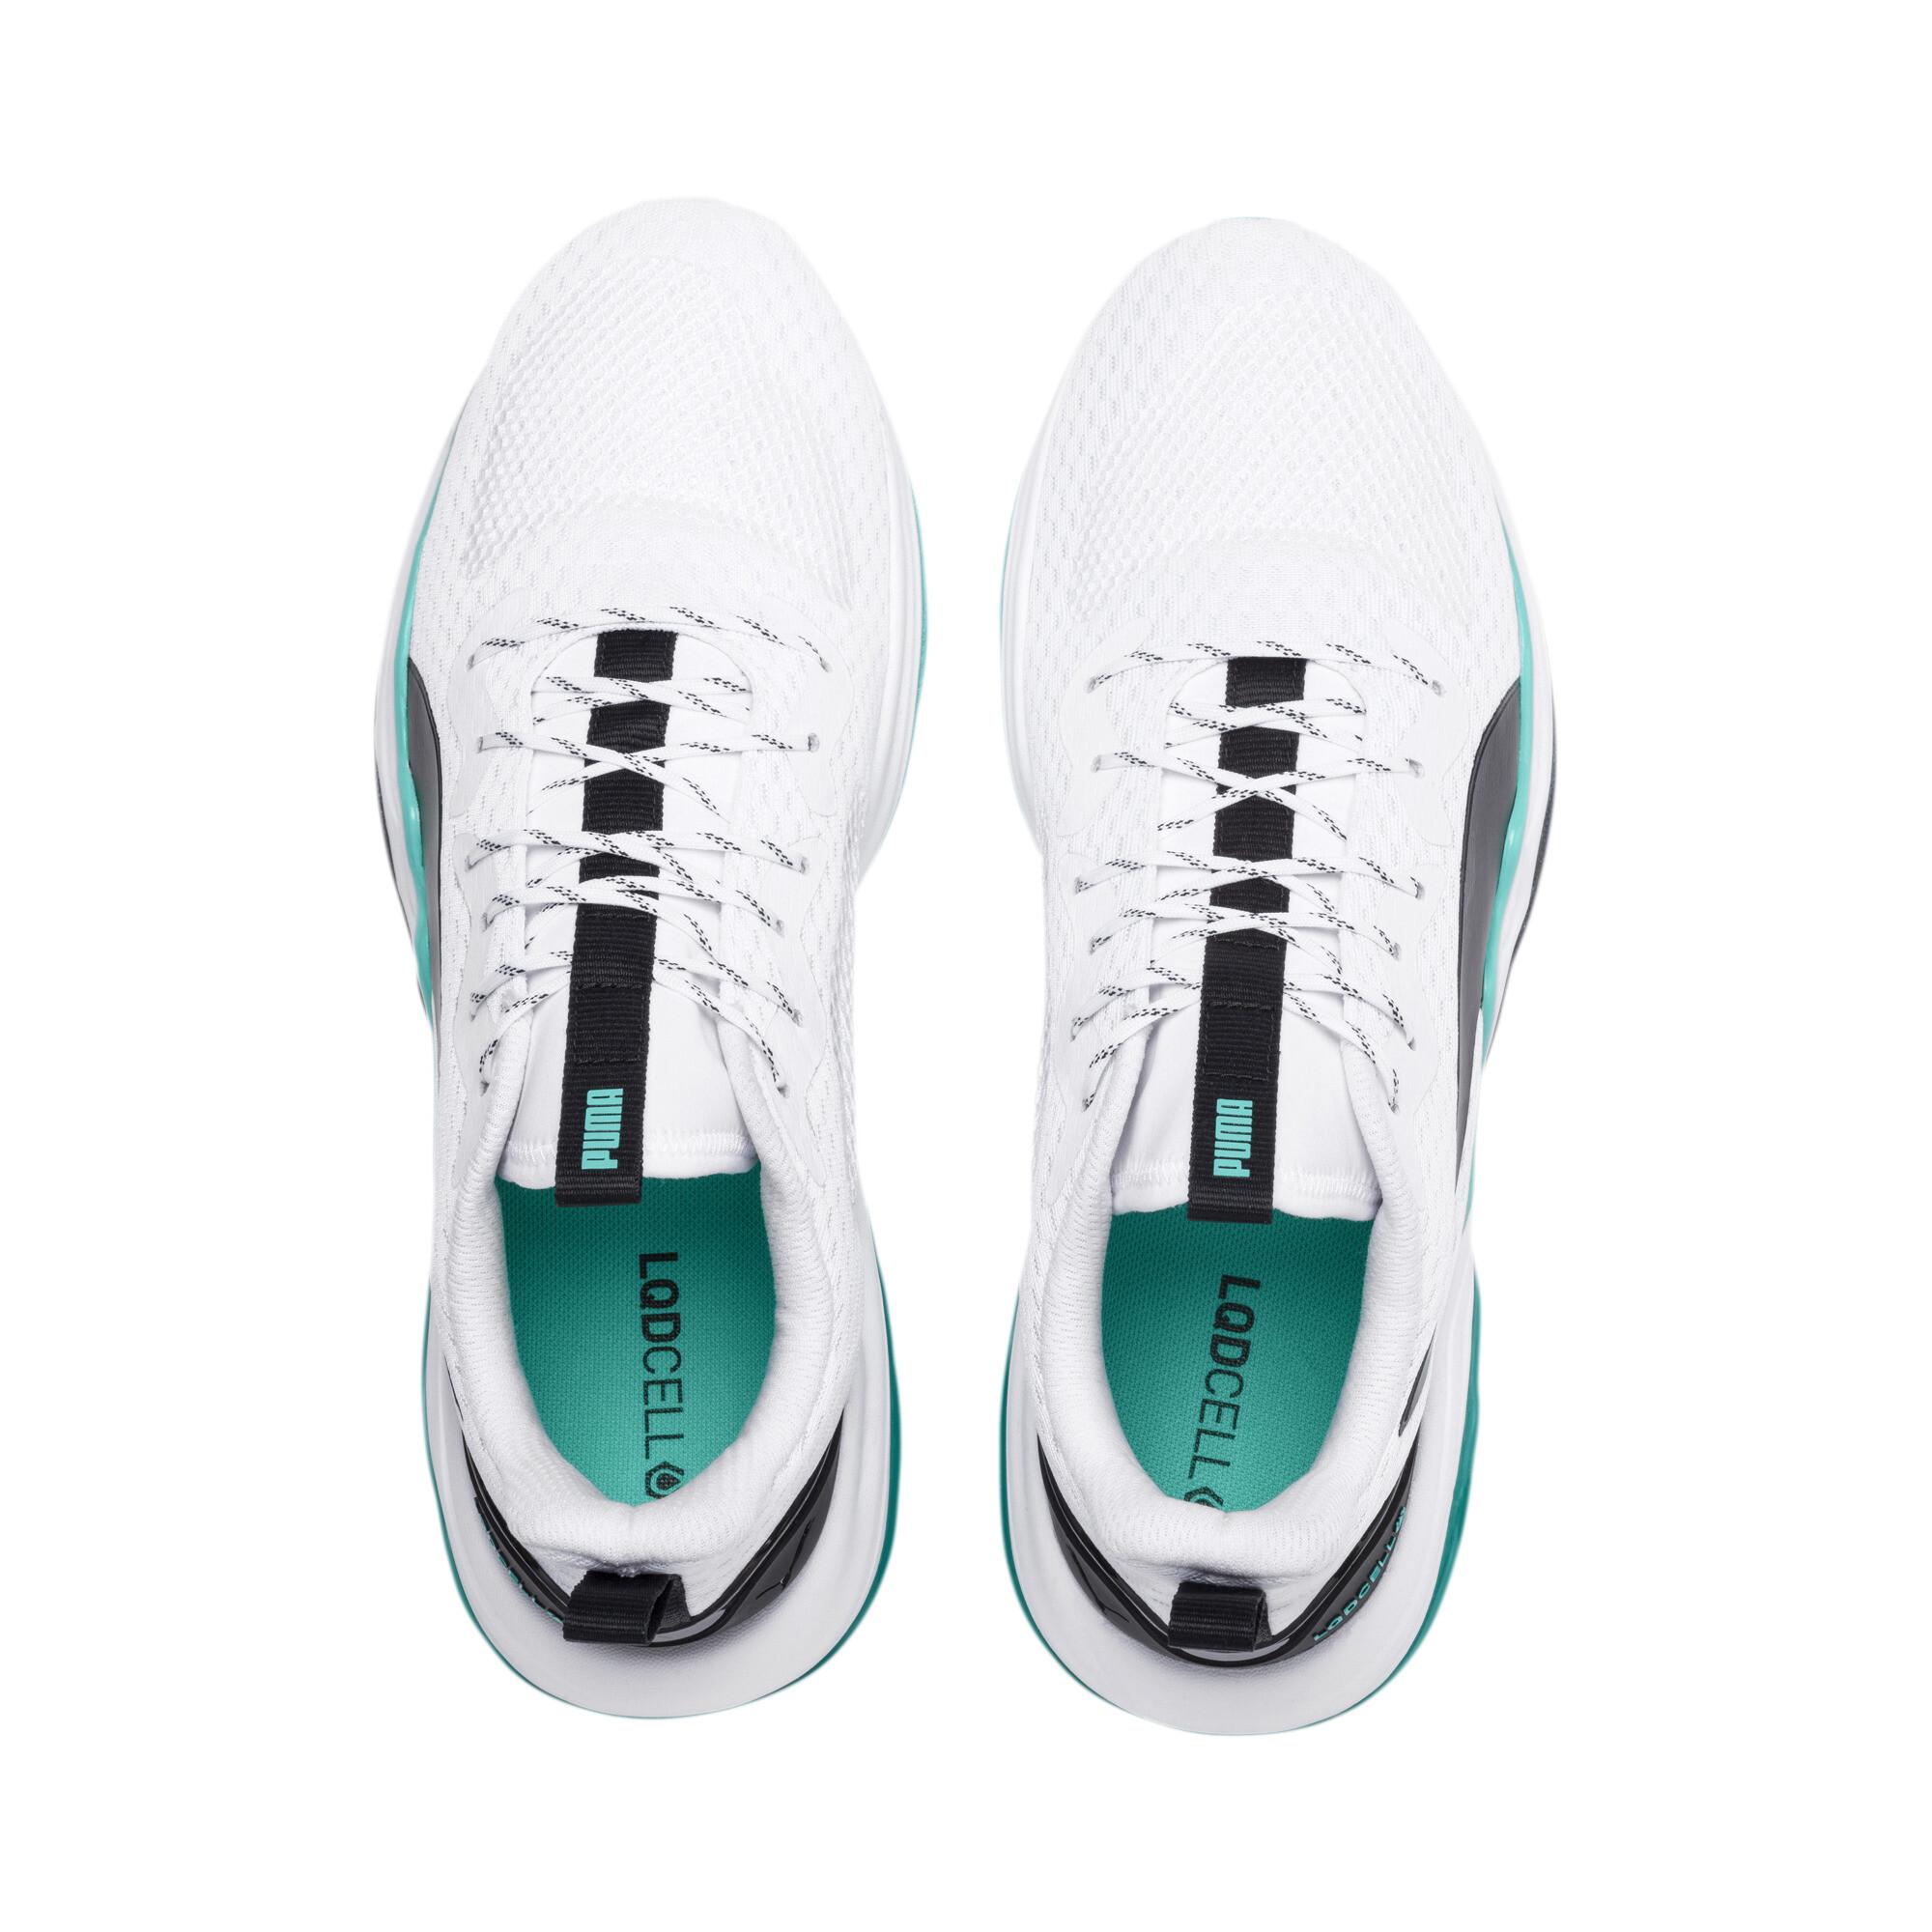 PUMA-Men-039-s-LQDCELL-Tension-Training-Shoes thumbnail 8